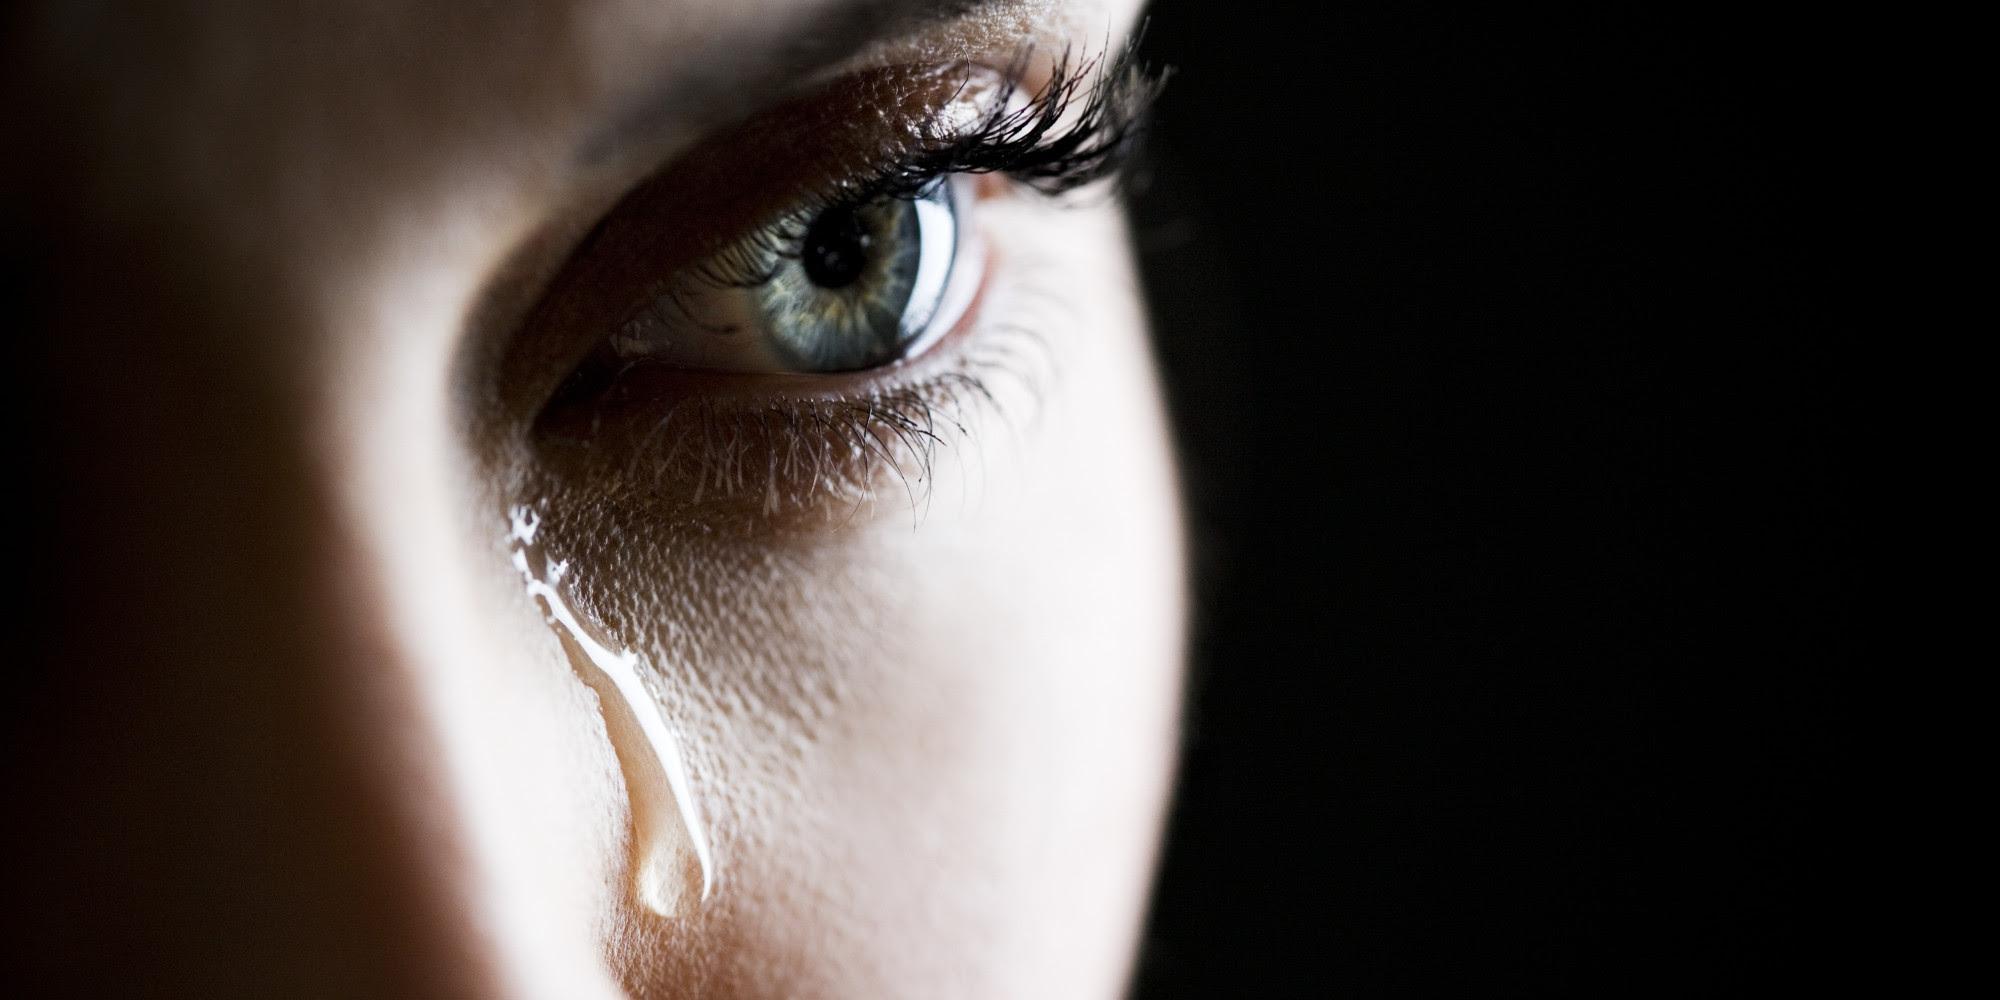 Girls Crying Eyes Quotes